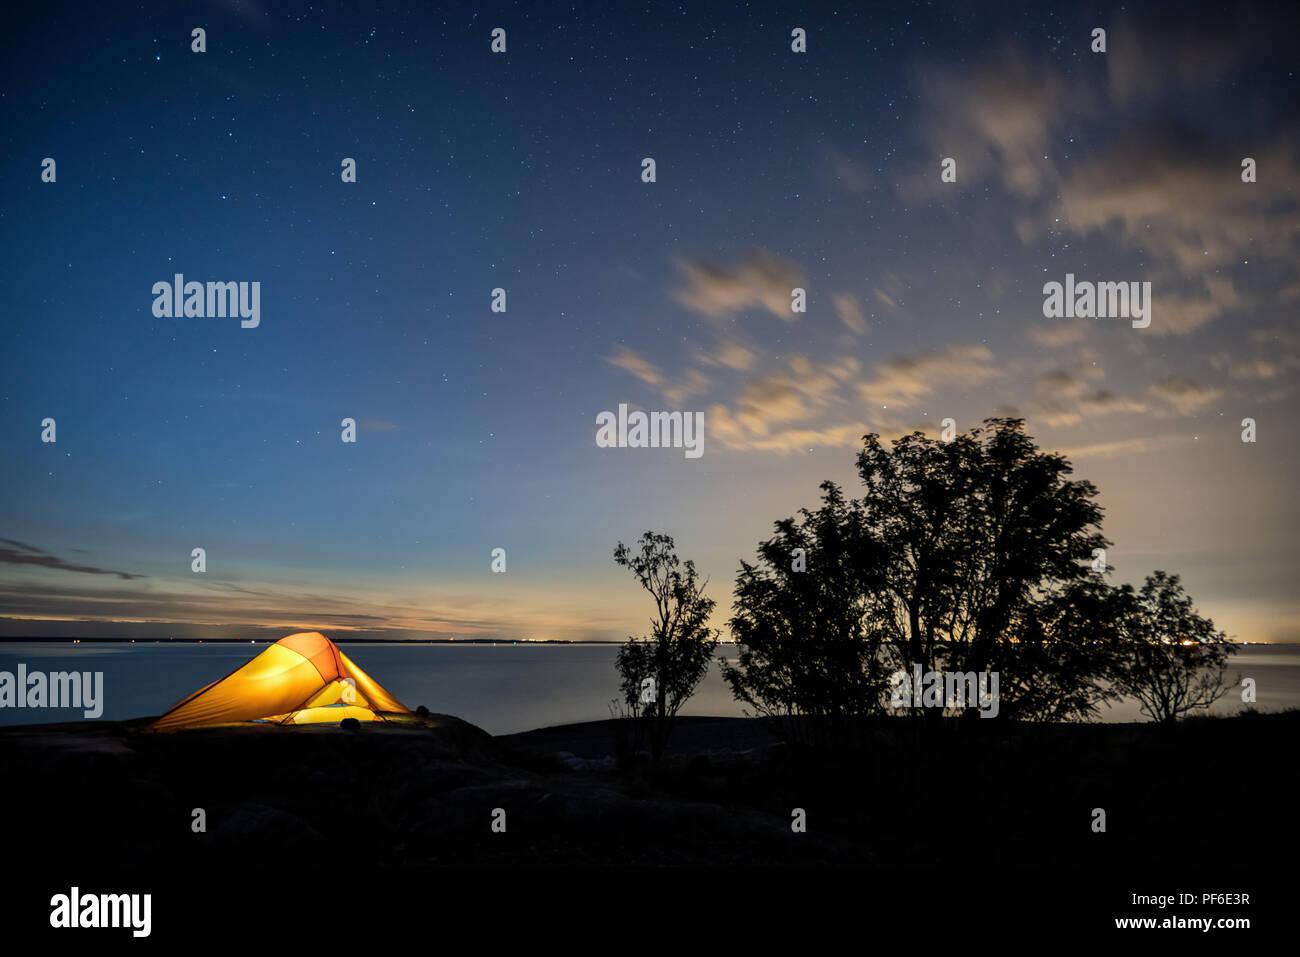 Camping at Örskär island, Kirkkonummi, Finland, Europe, EU - Stock Image